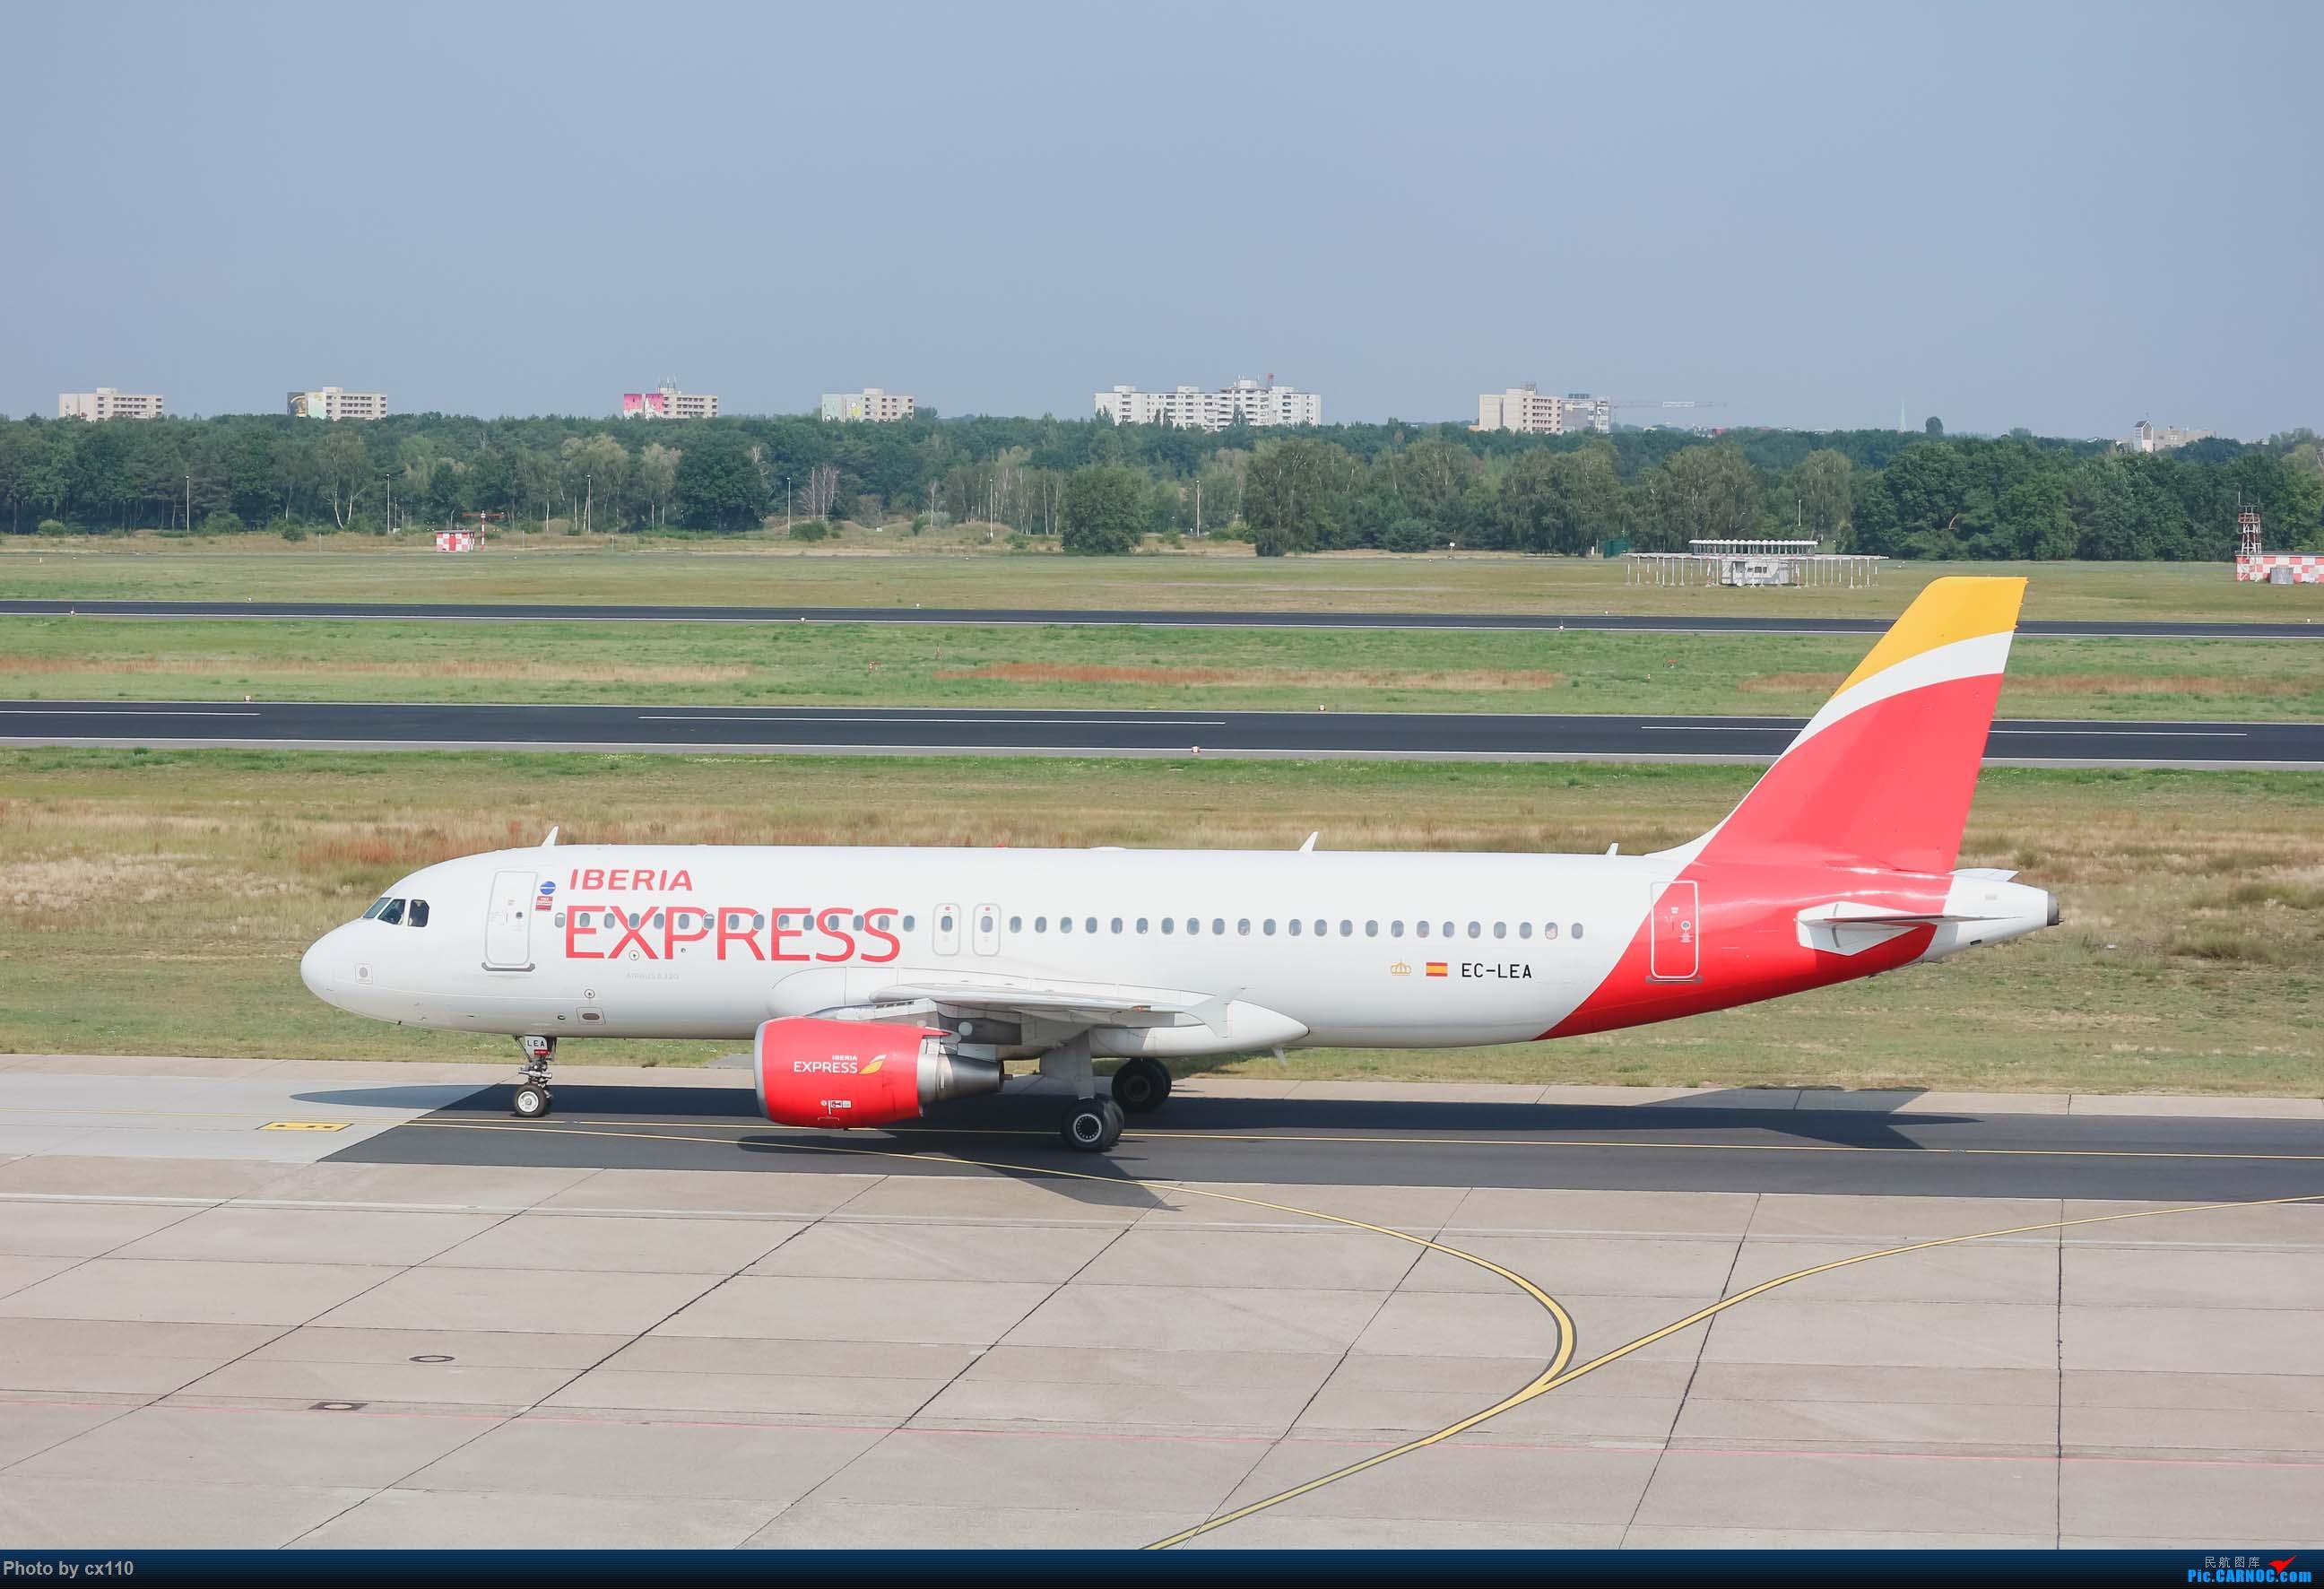 Re:[原创]欧洲机场拍机记-柏林/赫尔辛基/布拉格 AIRBUS A320-200 EC-LEA